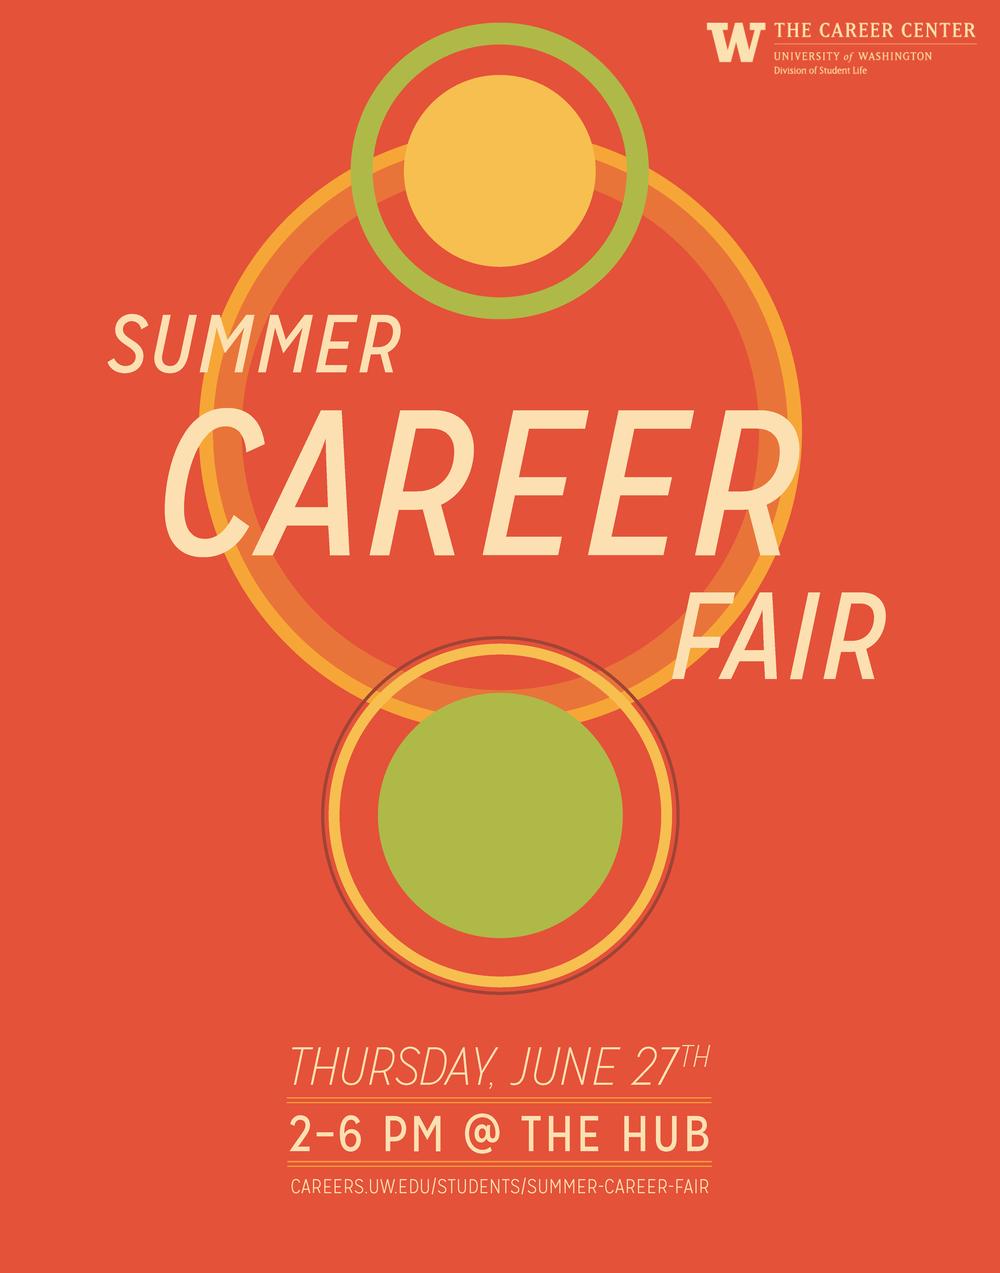 career fair poster Google Search Poster